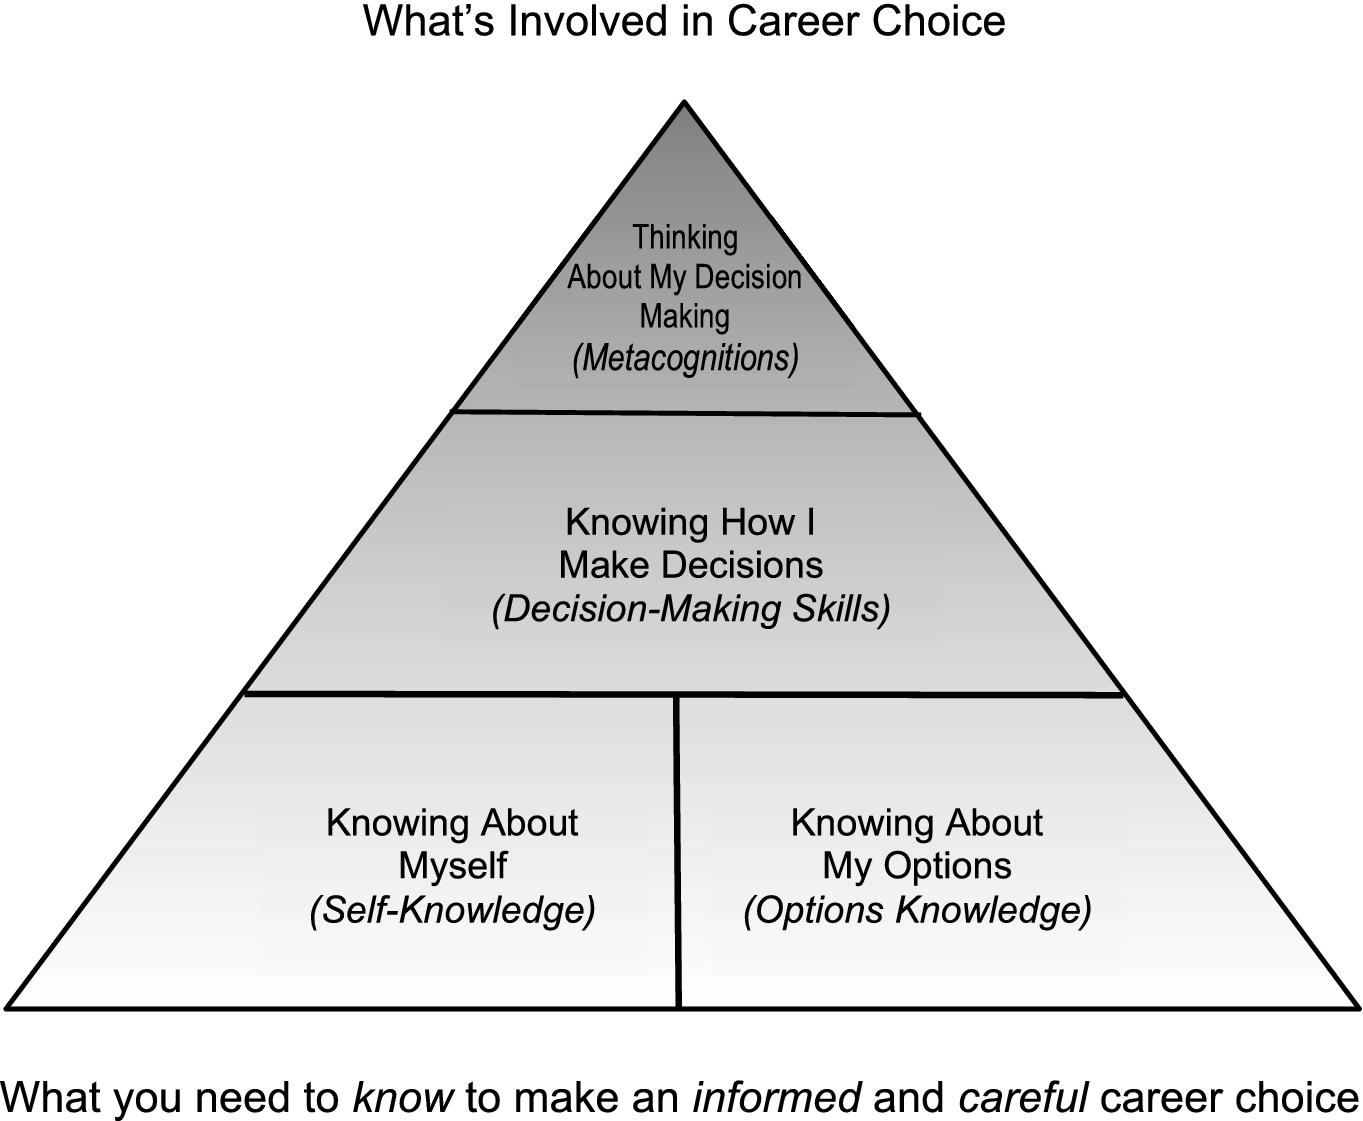 Innovating Career Development Through Technology via a